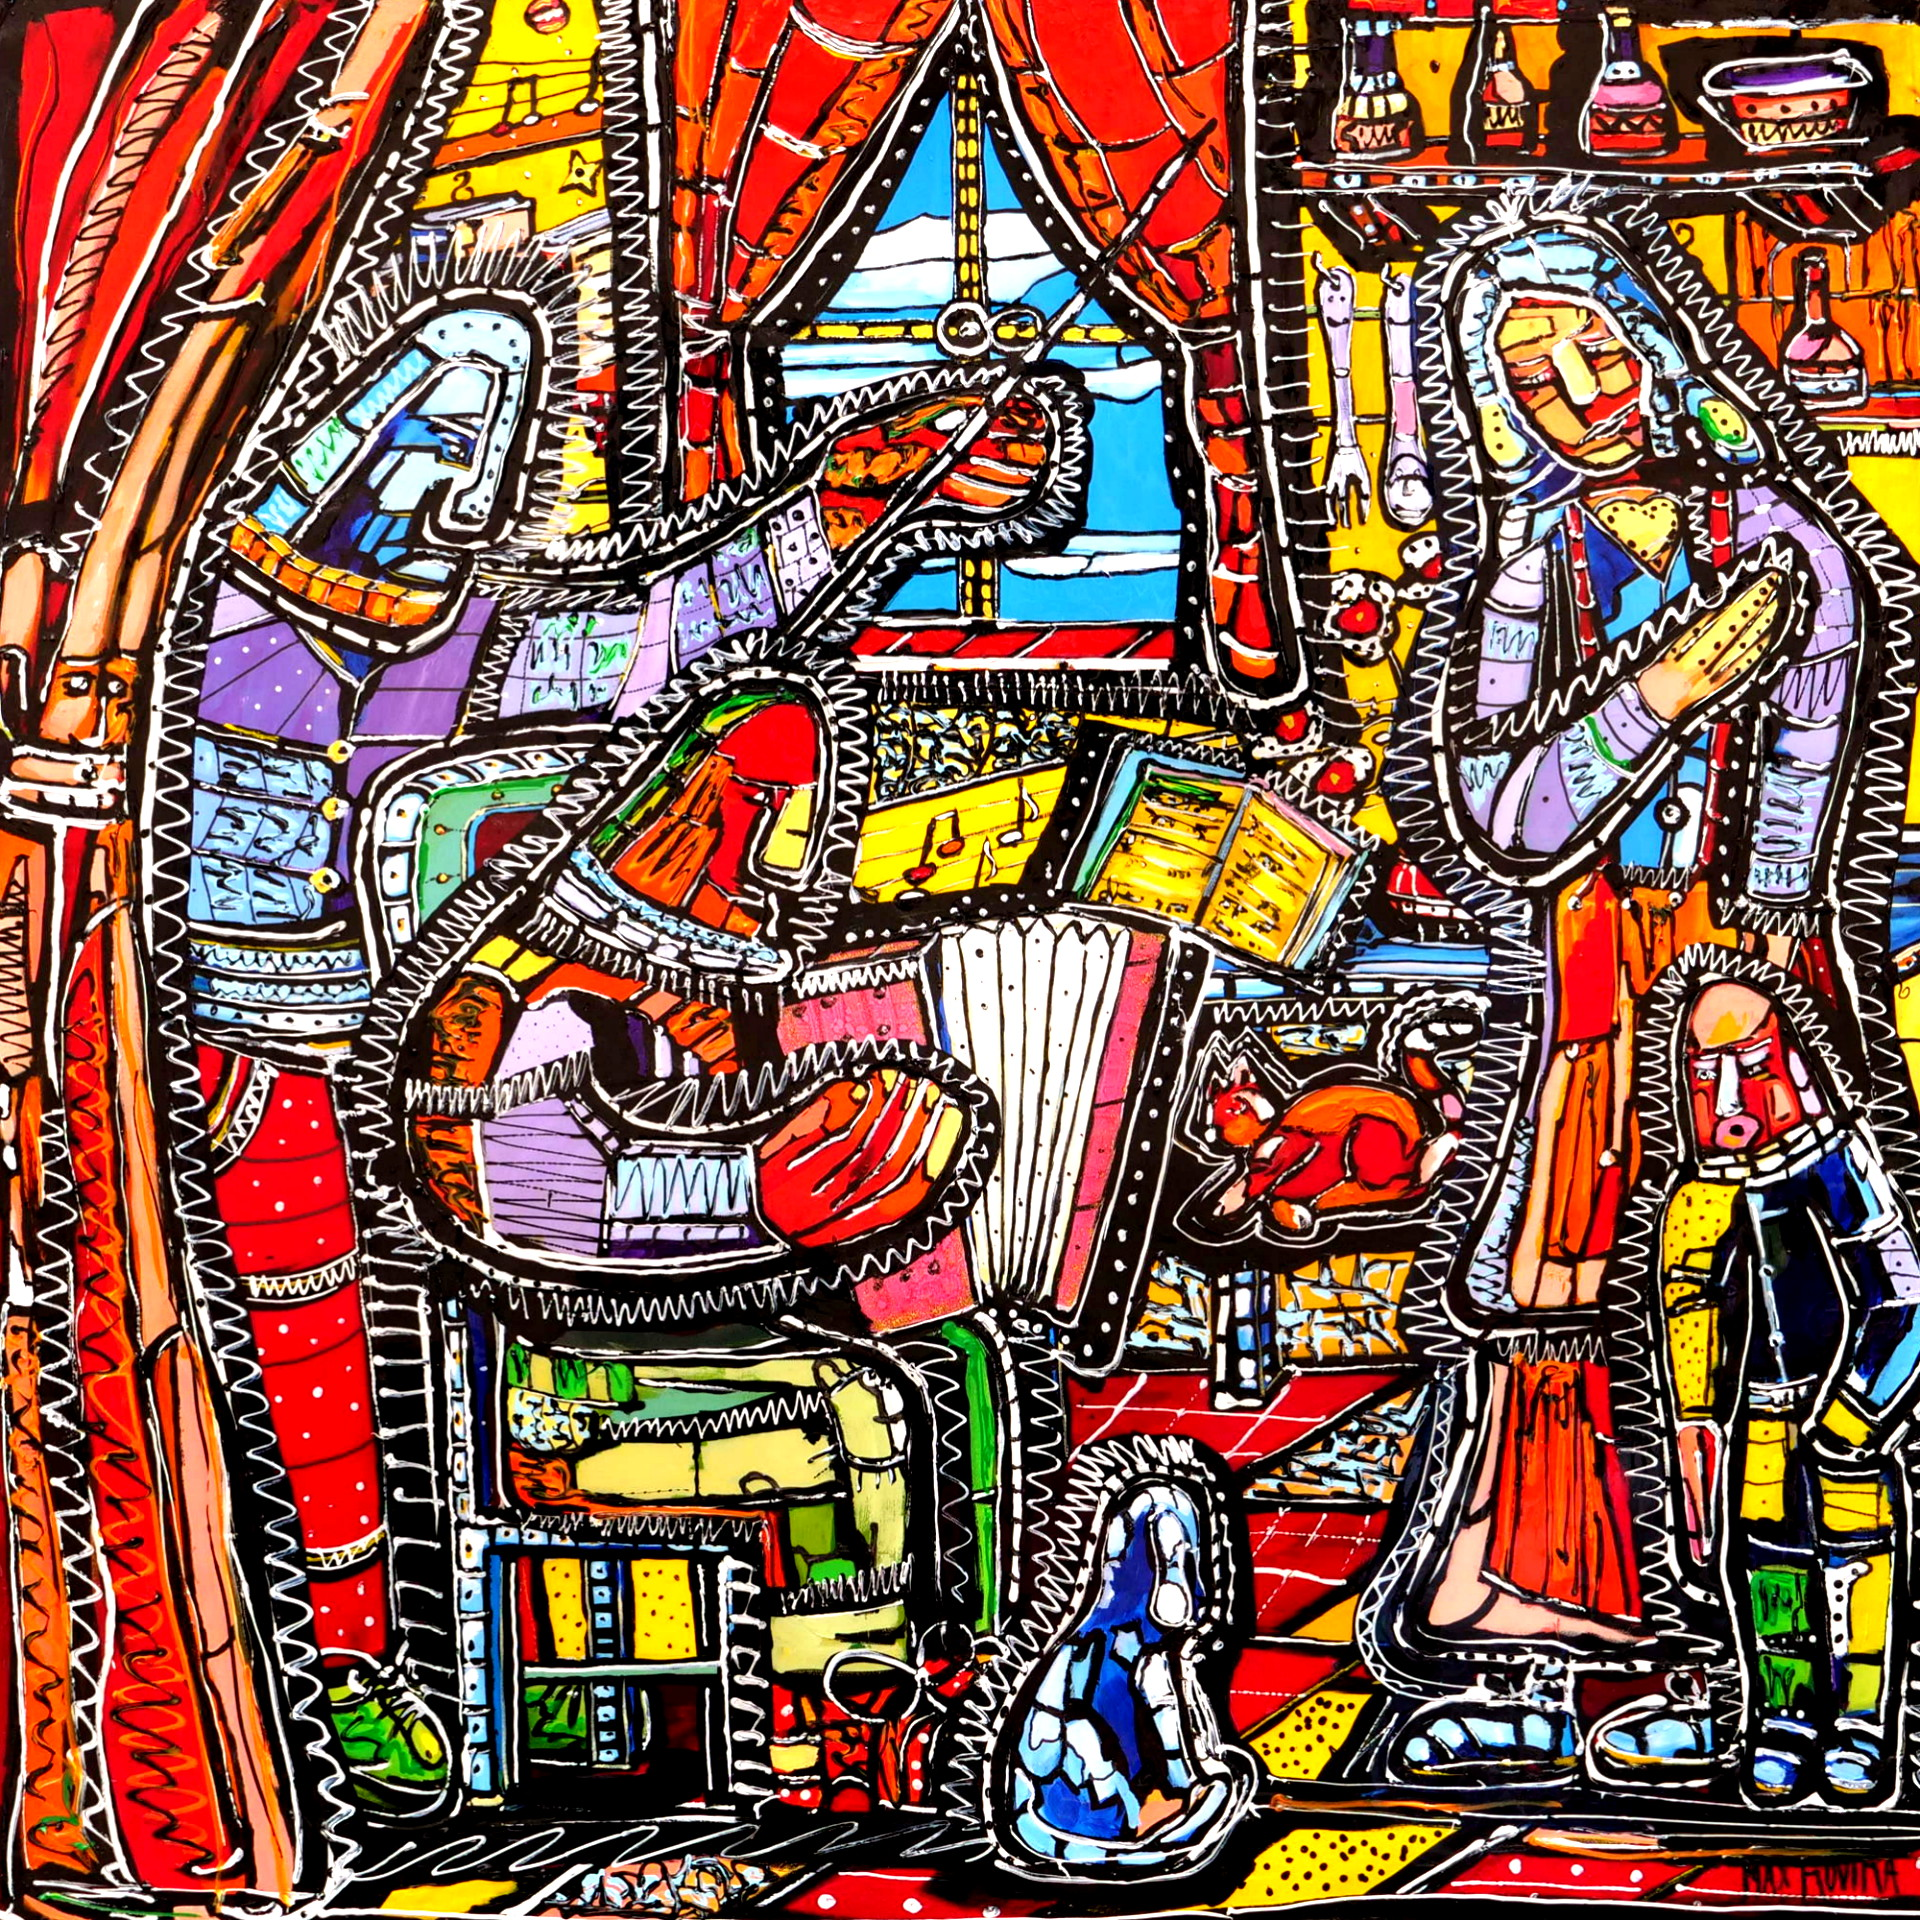 max rovira artiste peintre collioure la leçon d'accordéon